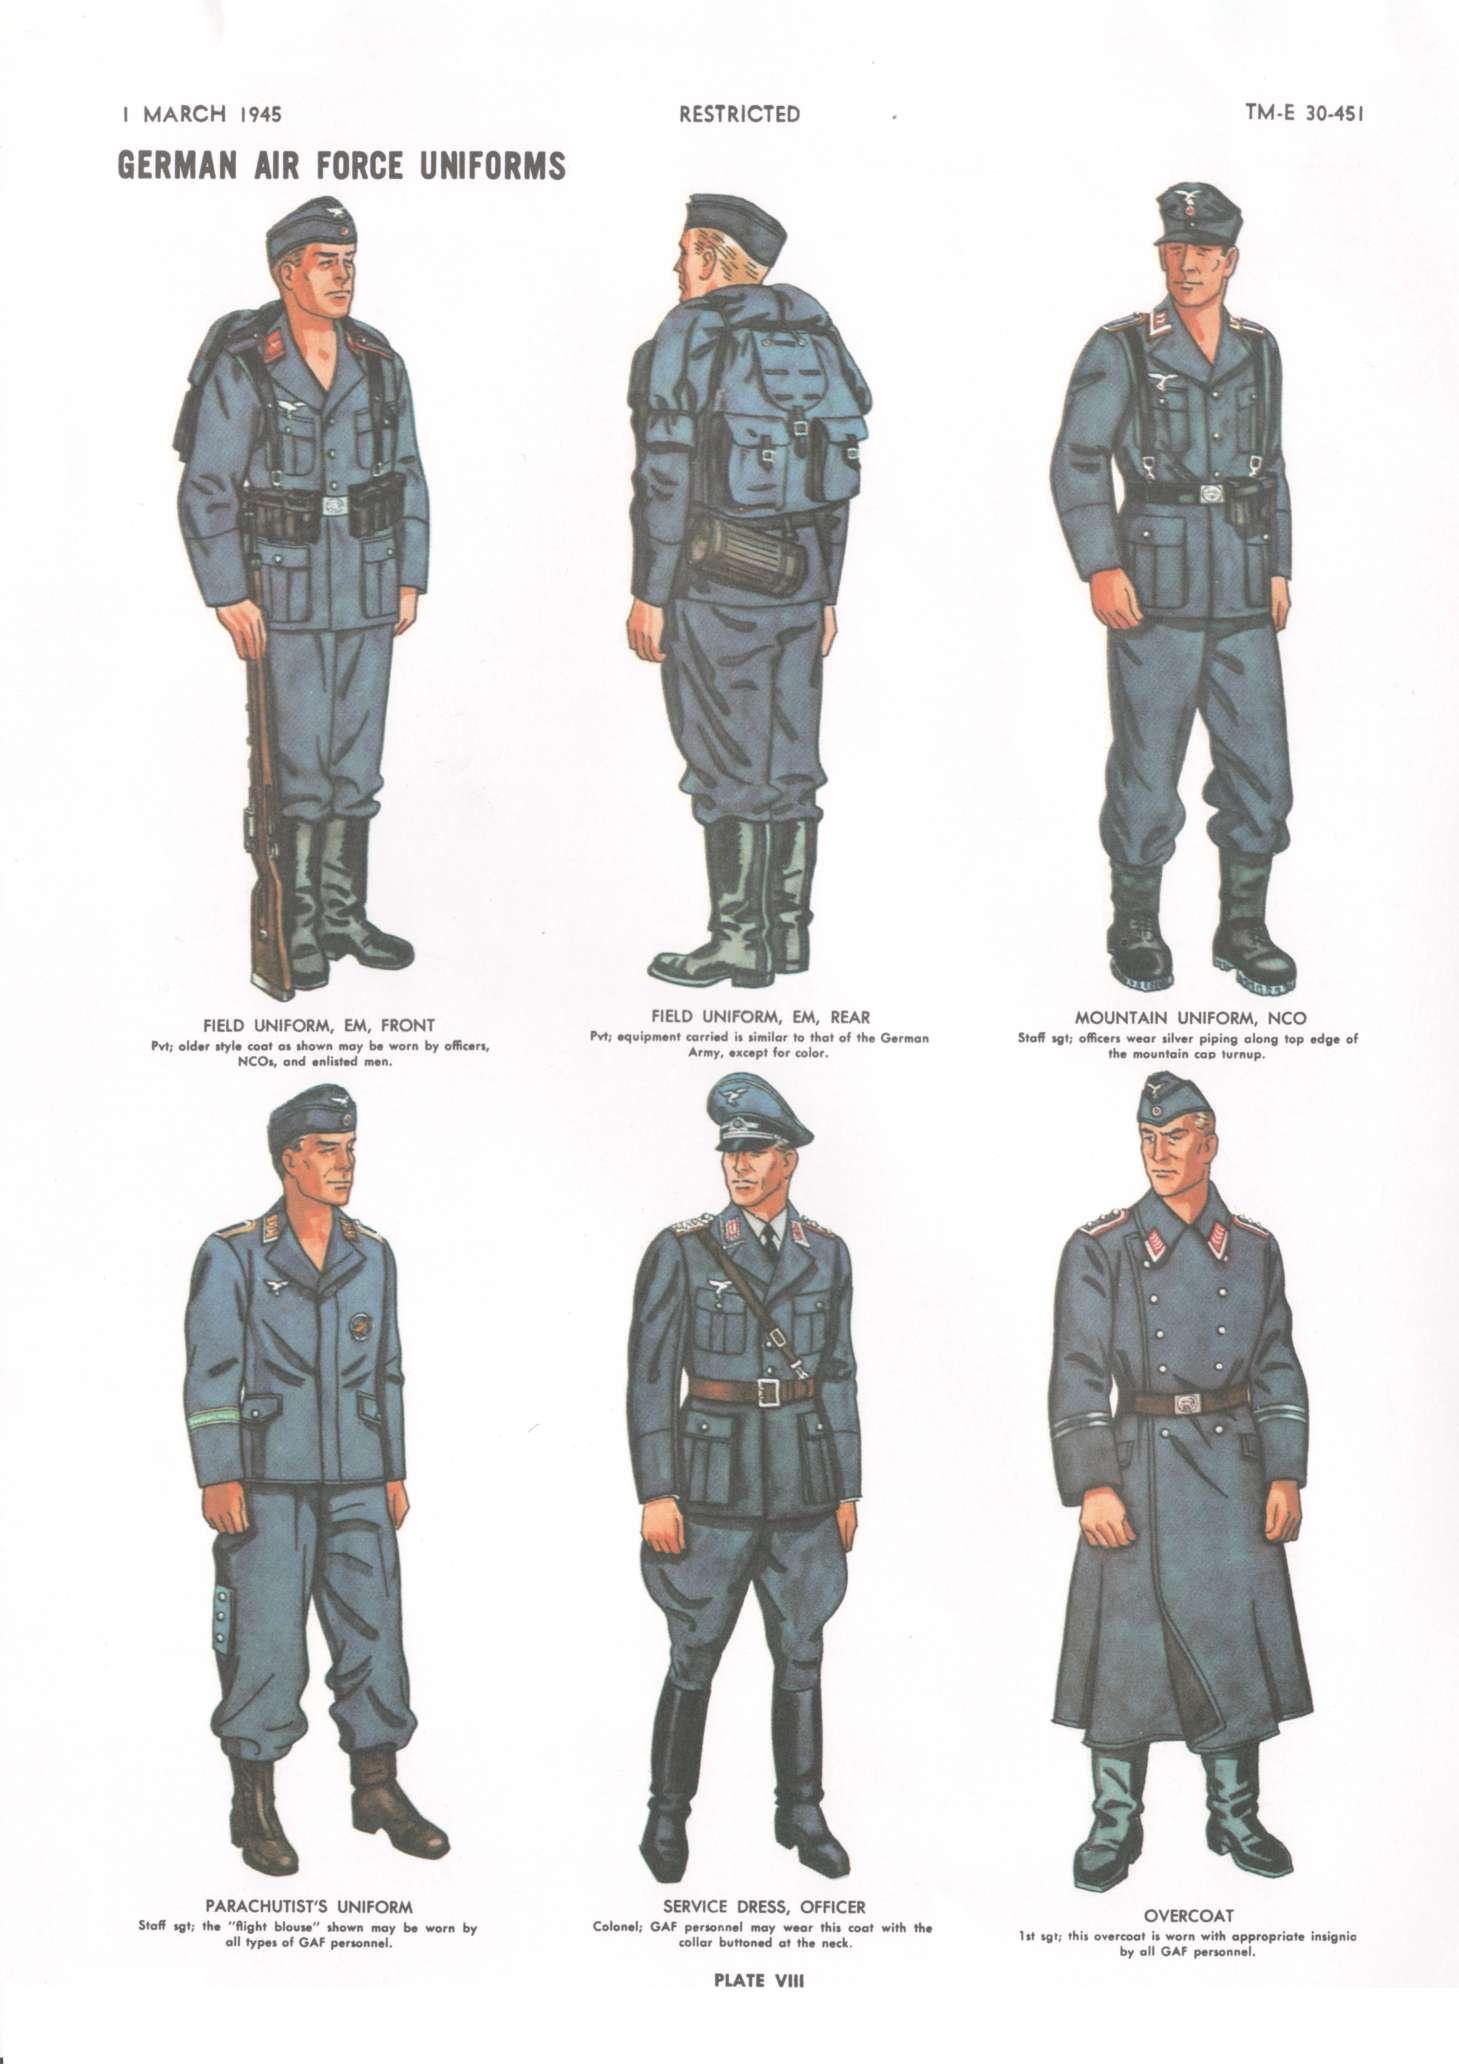 Us army dress blue uniform rank insignia